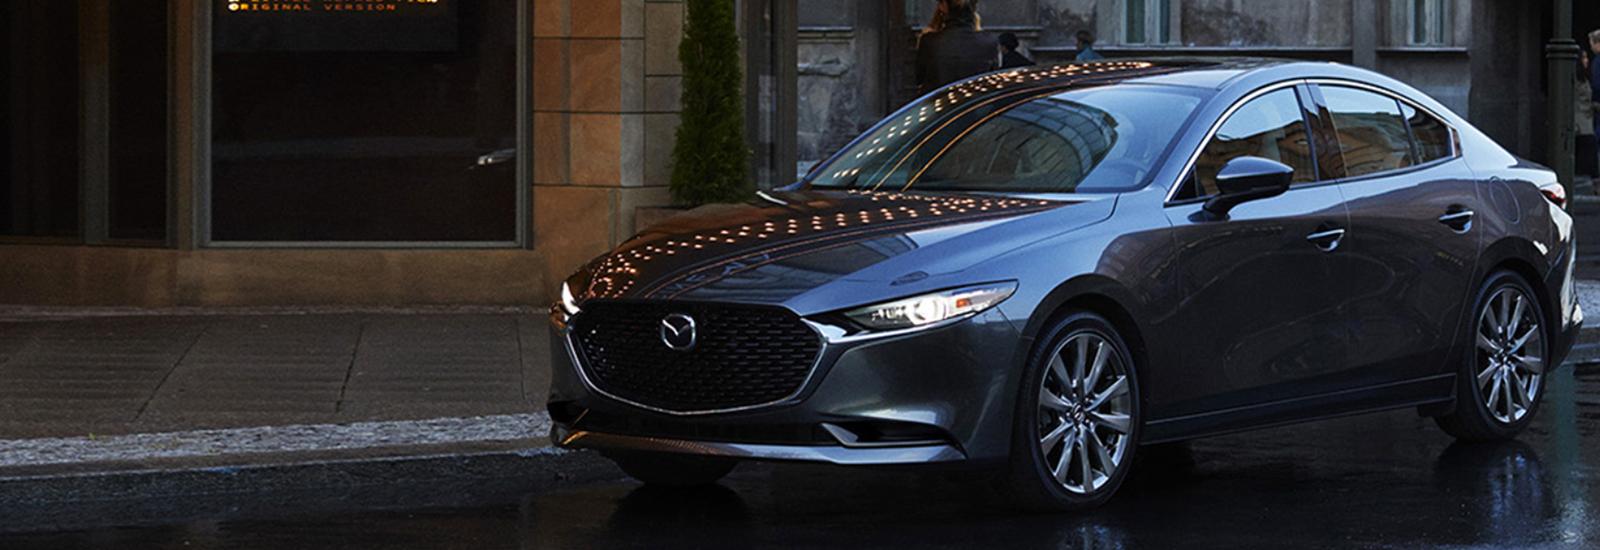 New Mazda3 for sale